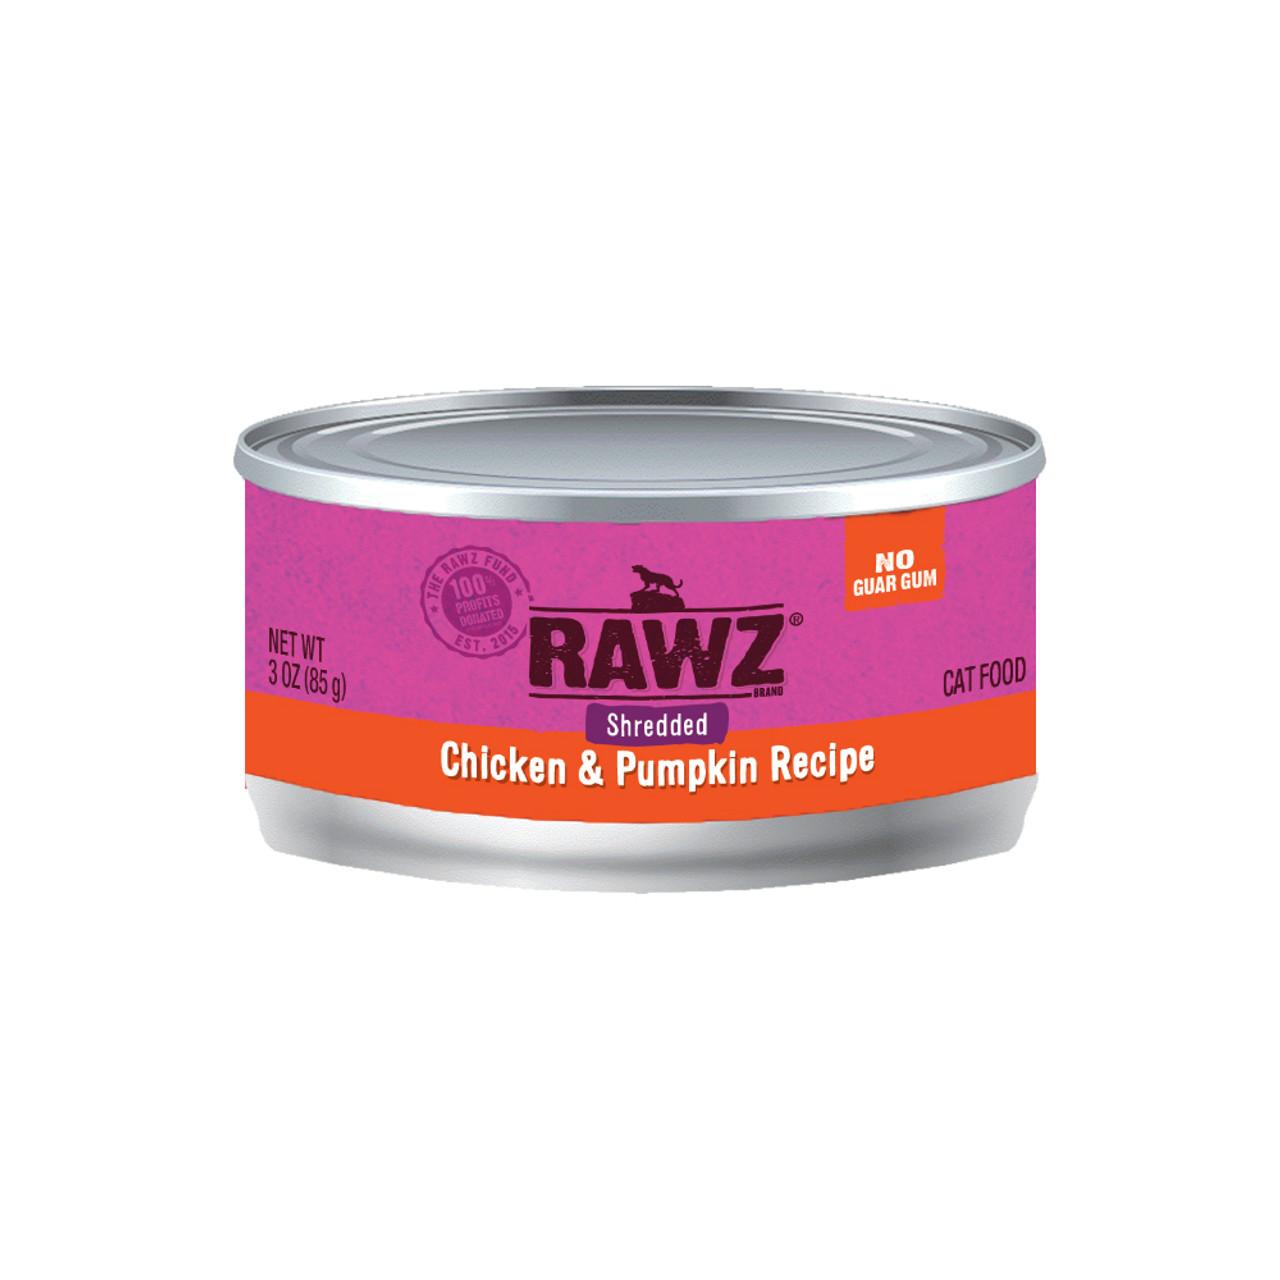 RAWZ Shredded Chicken & Pumpkin Recipe Adult Canned Cat Food